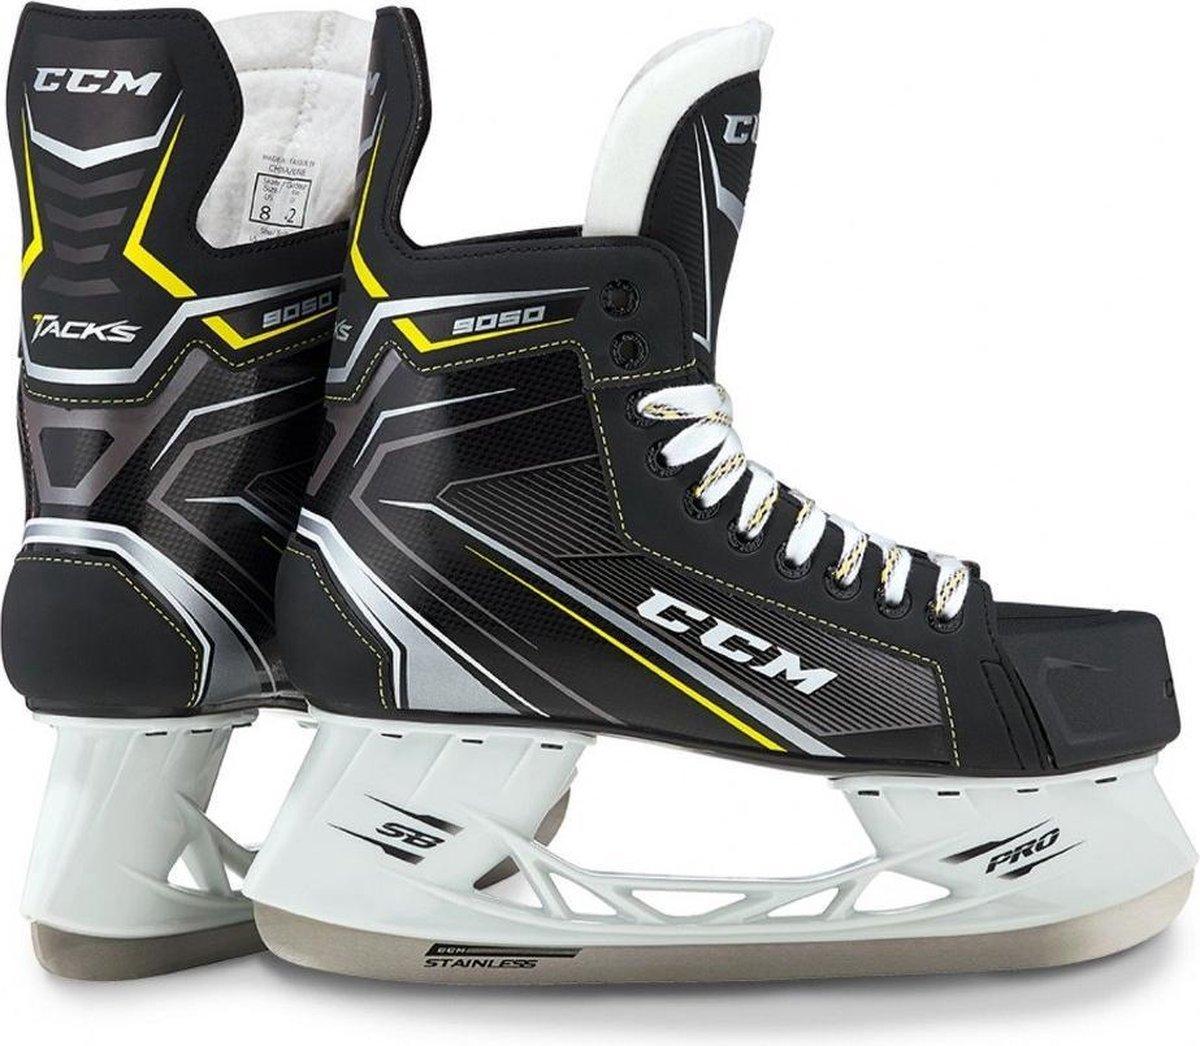 CCM ijshockeyschaatsen Tacks 9050 maat 34